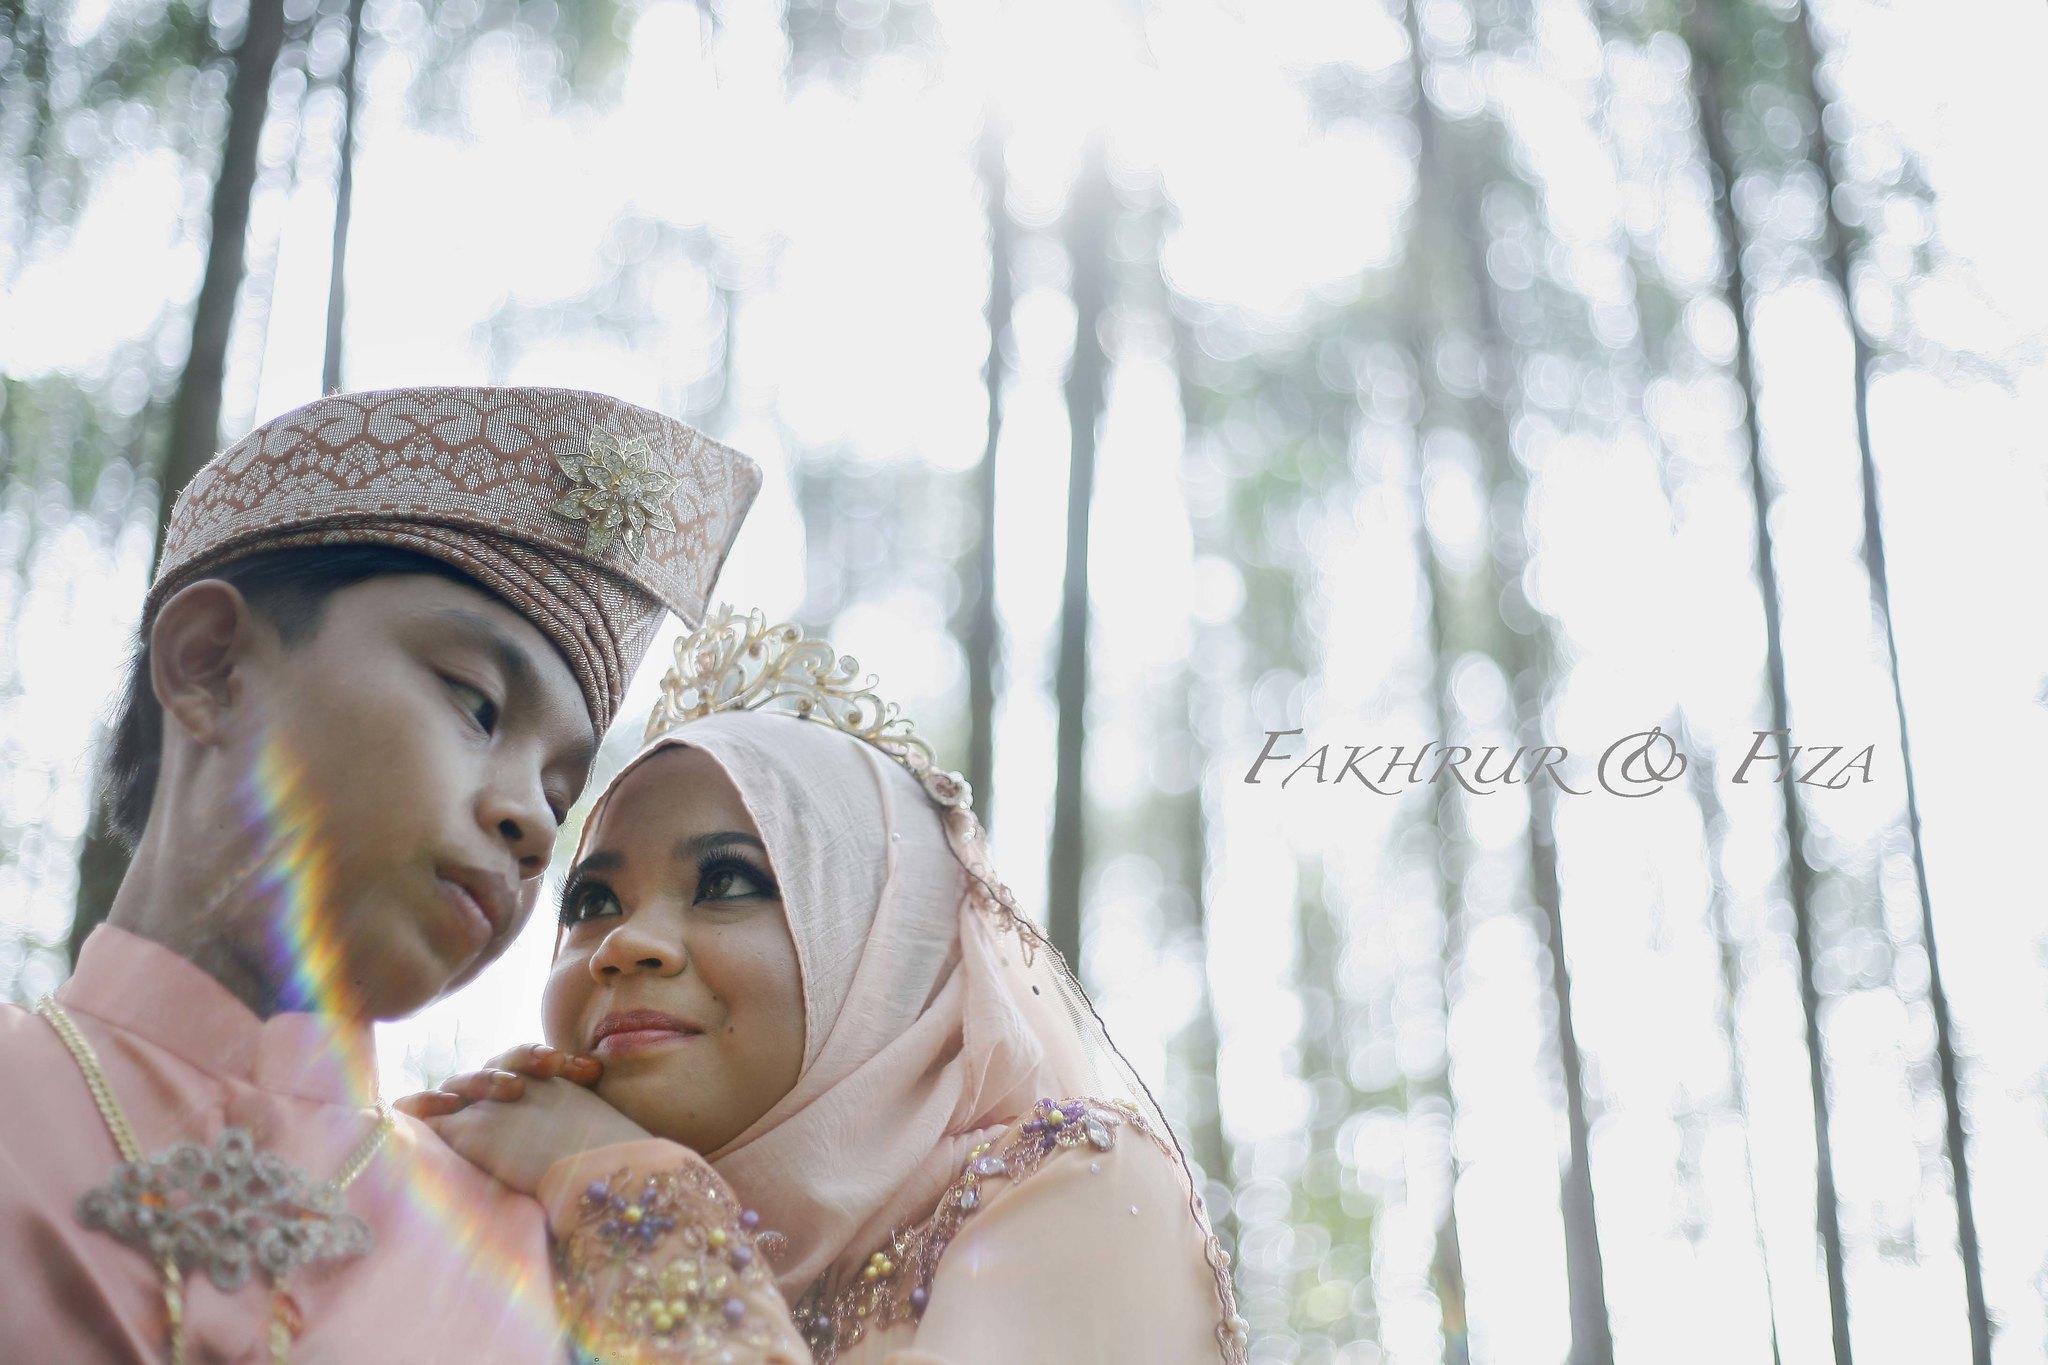 Fakhrur & Fiza